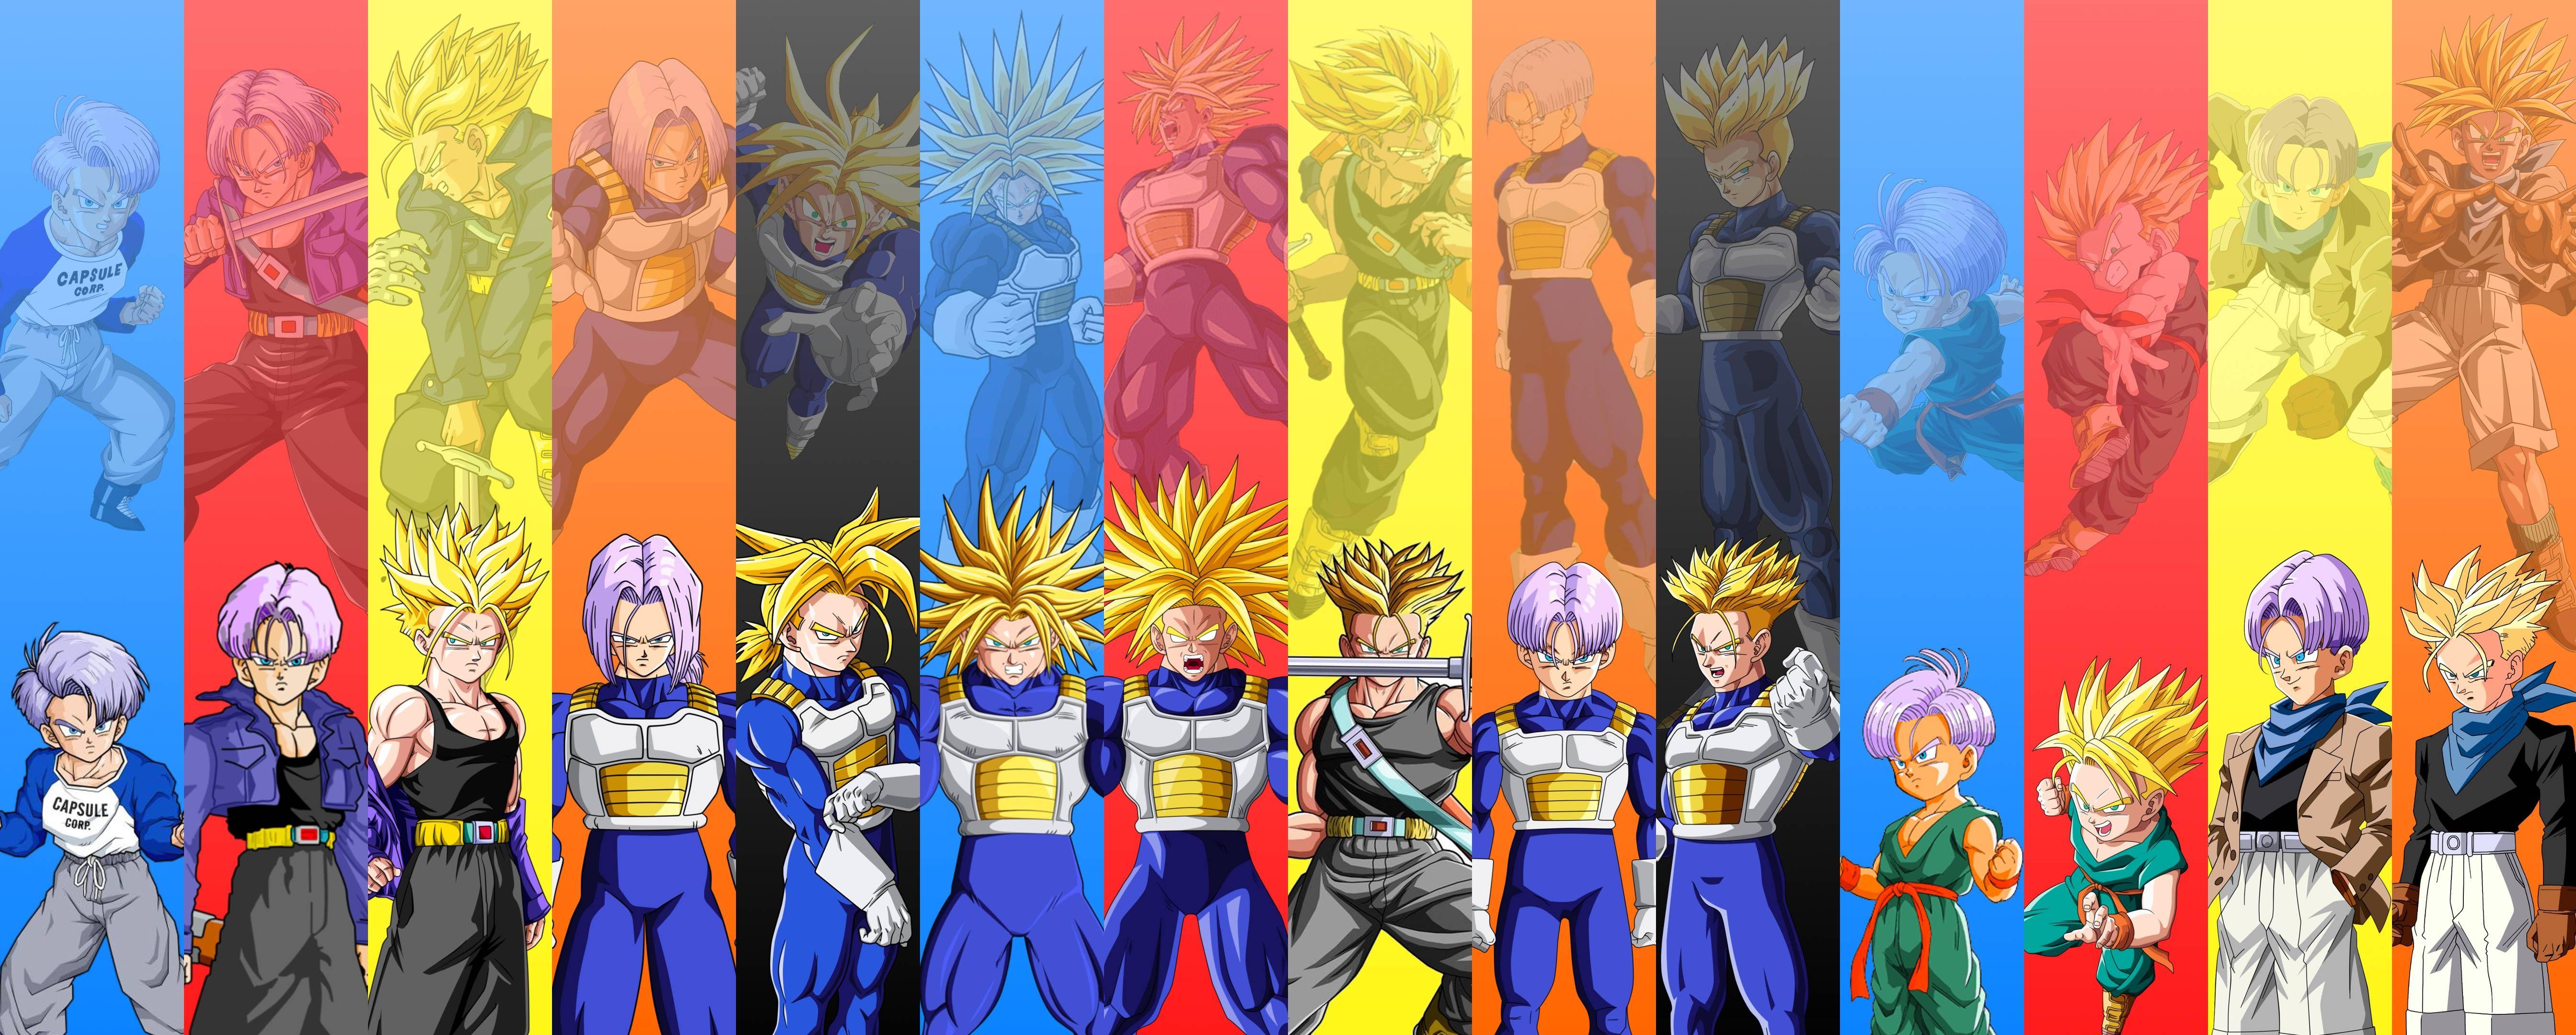 Dbz Dual Screen Wallpapers: Dragon Ball, Dragon Ball Z Y Dragon Ball Gt